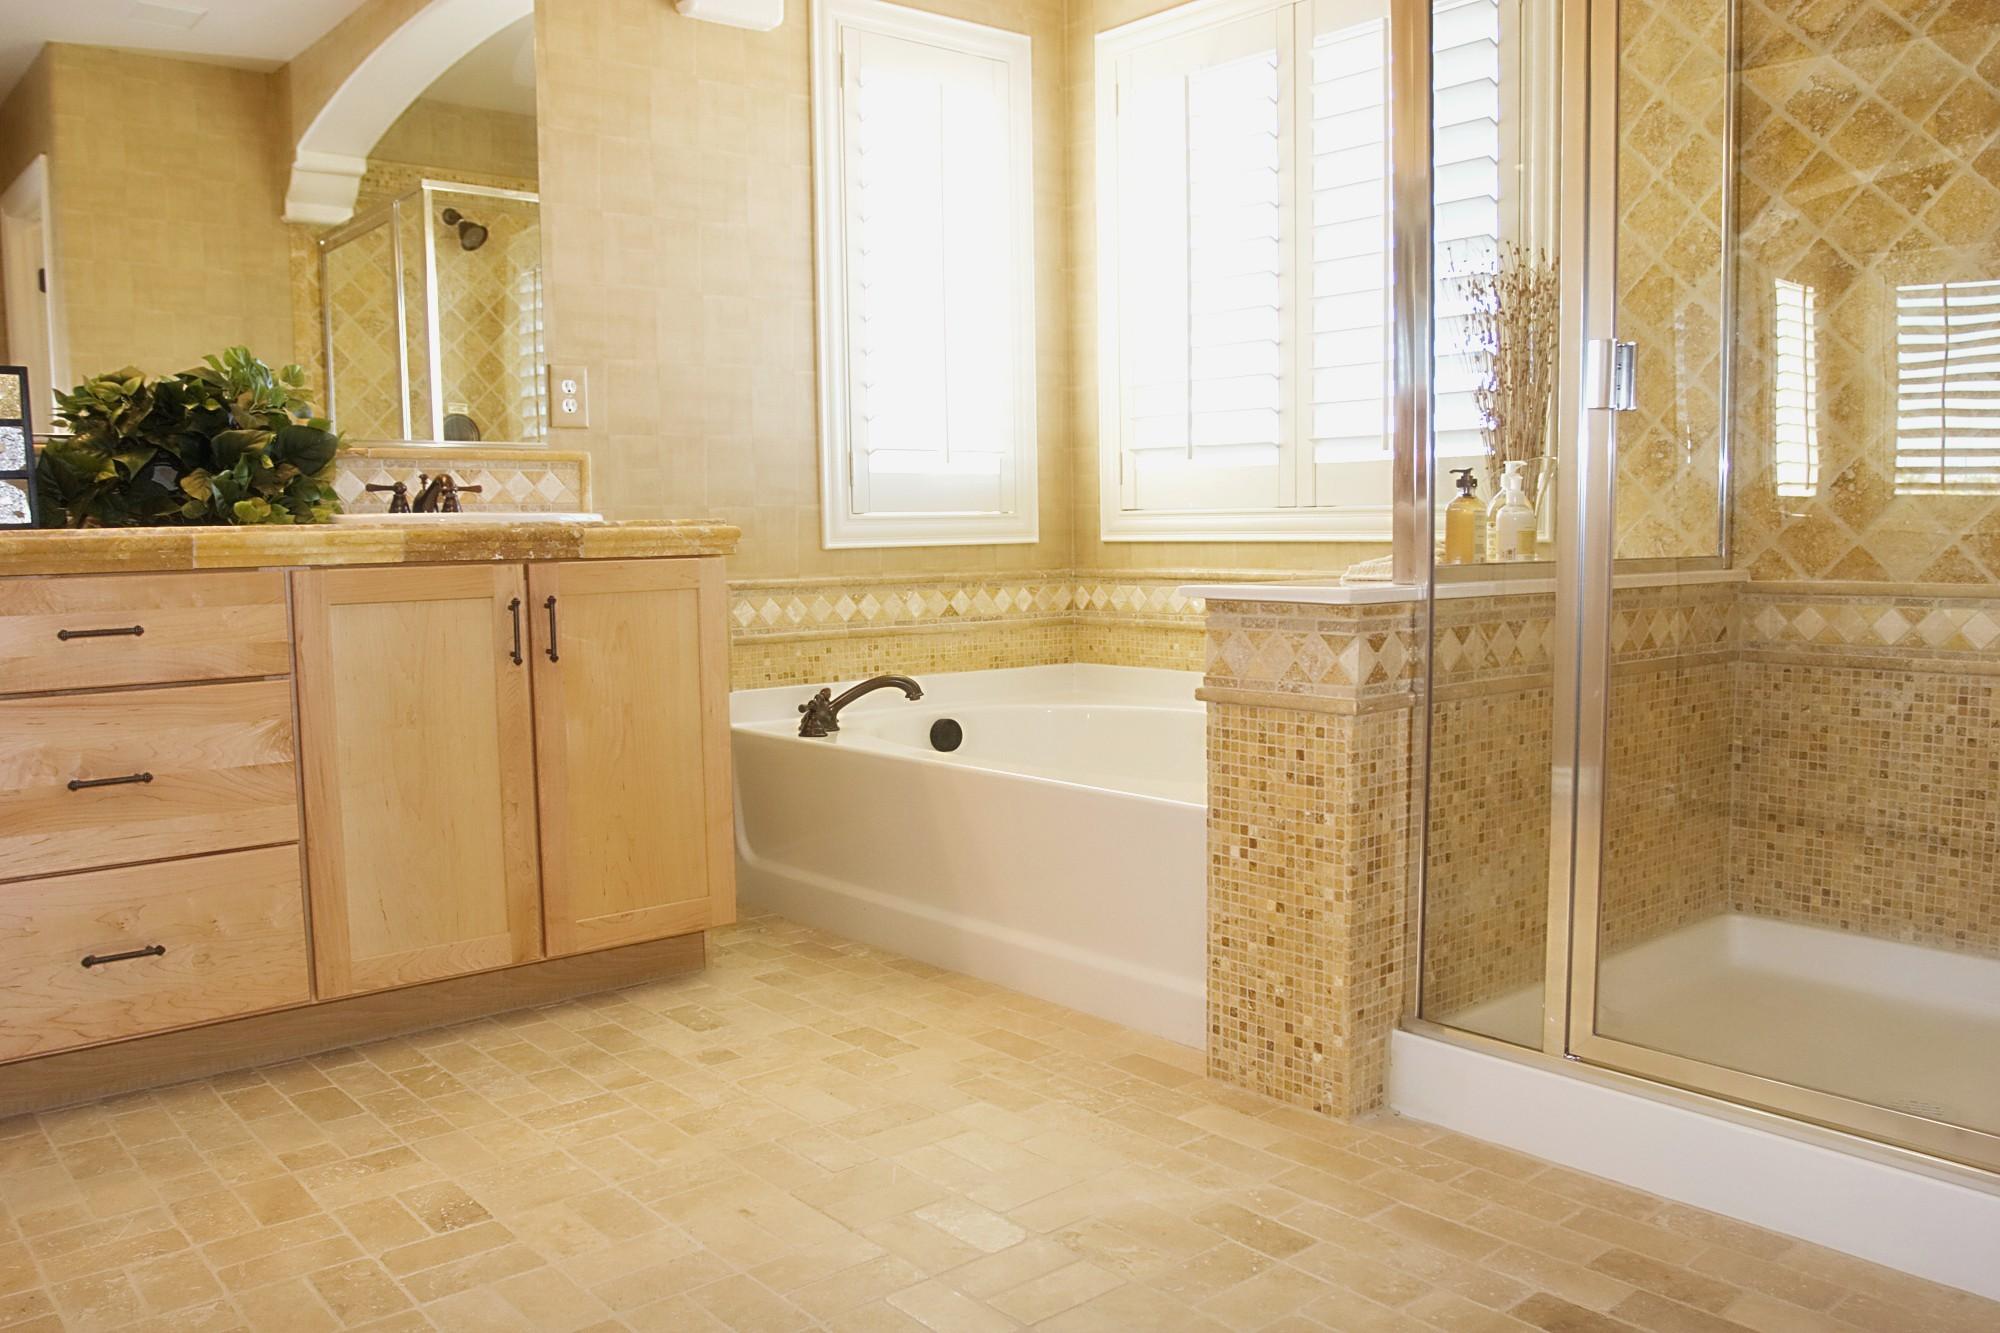 Bathroom Remodel Supplies Cool Bathroom Remodel Bathroom Remodeling Supplies Beautiful Home Concept